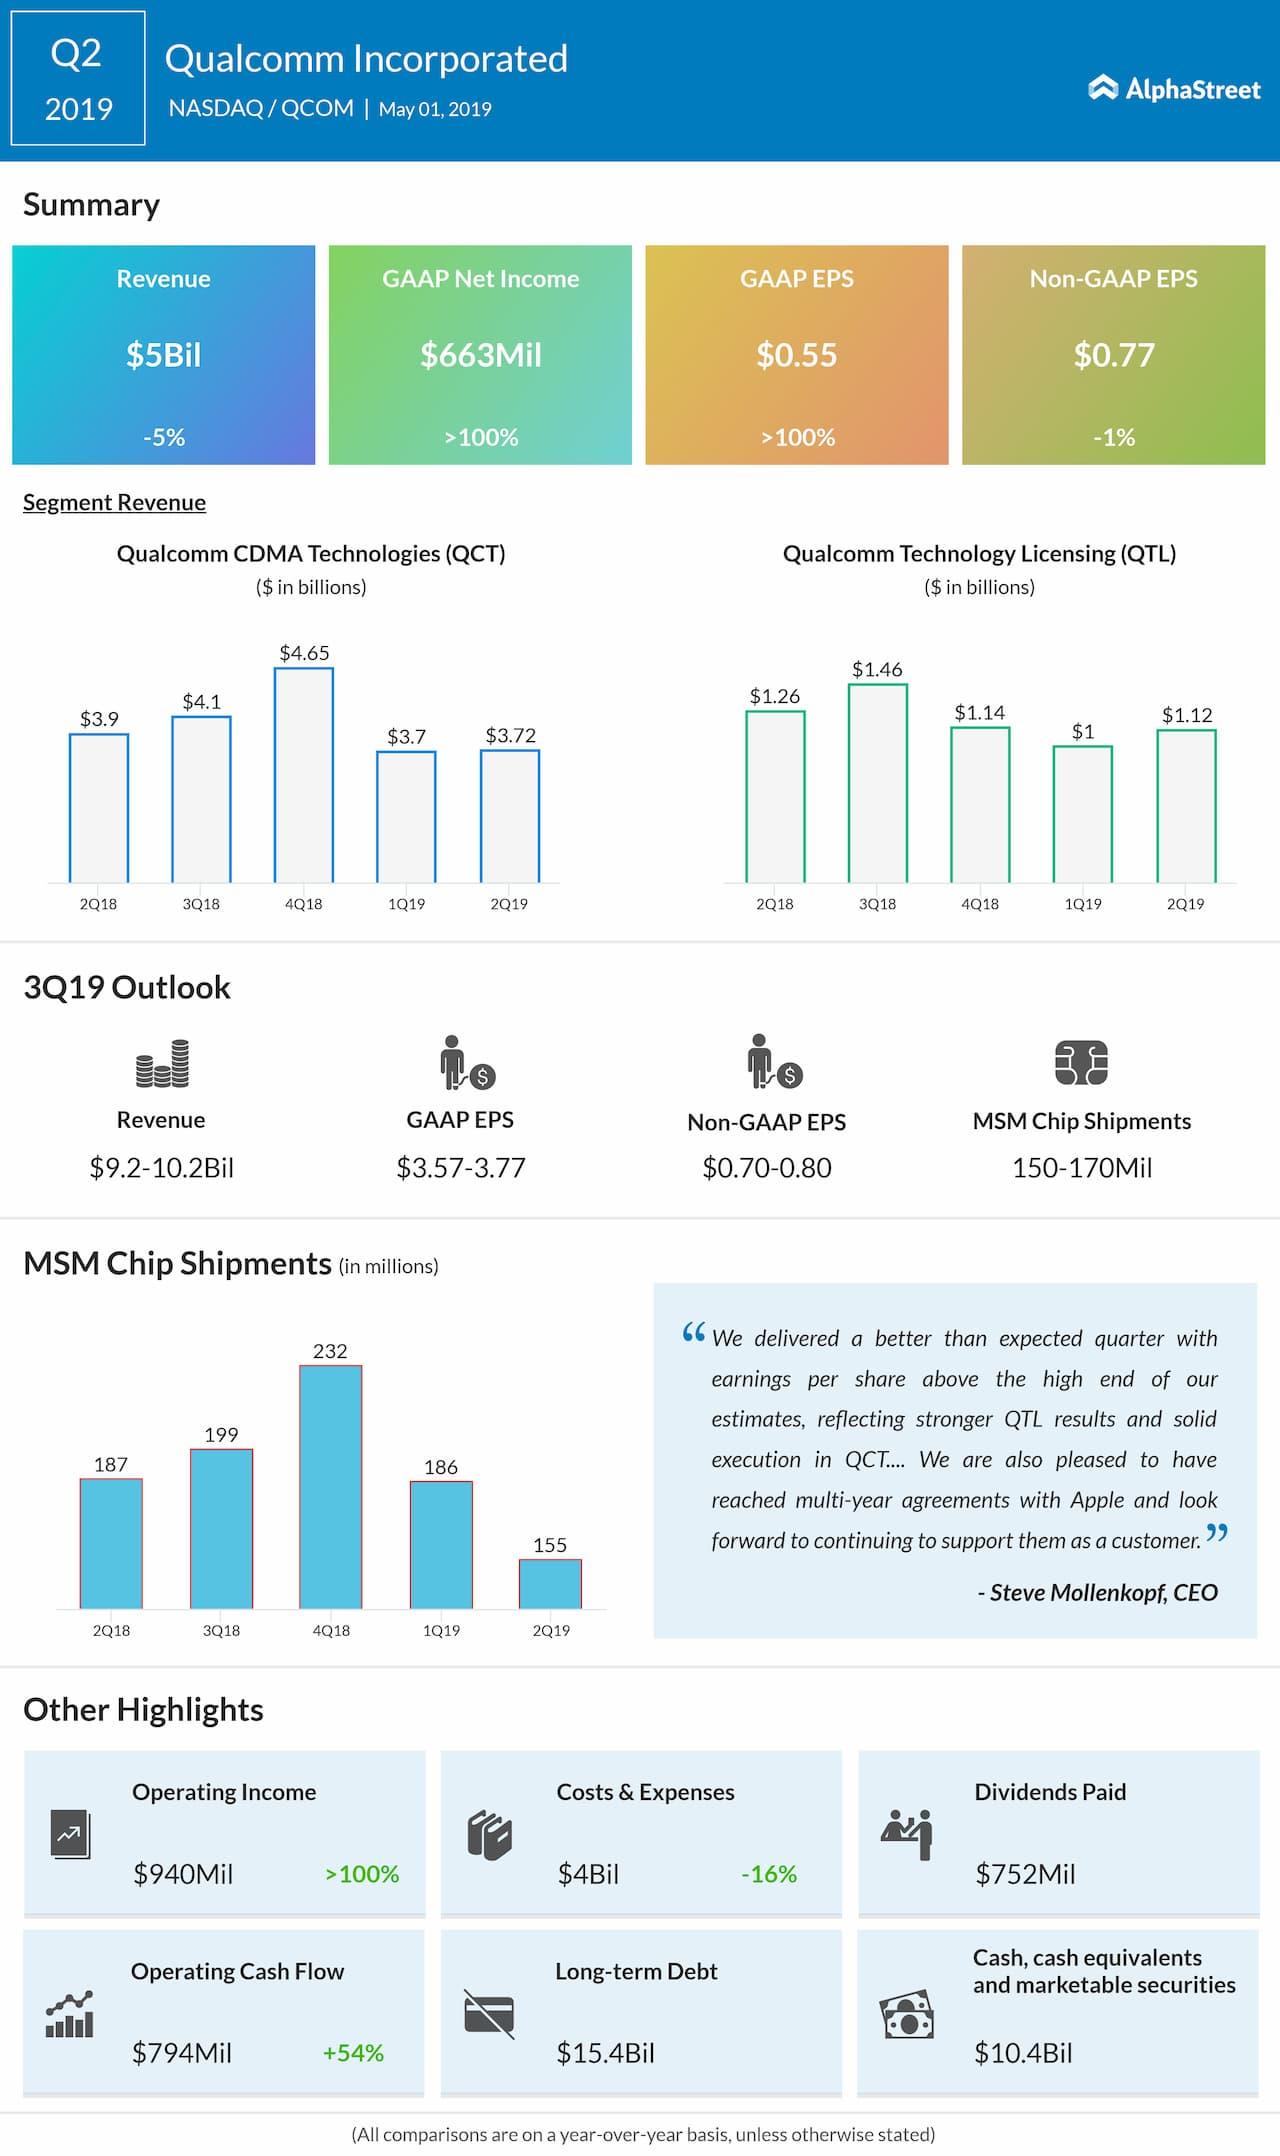 Qualcomm Q2 2019 earnings infographic